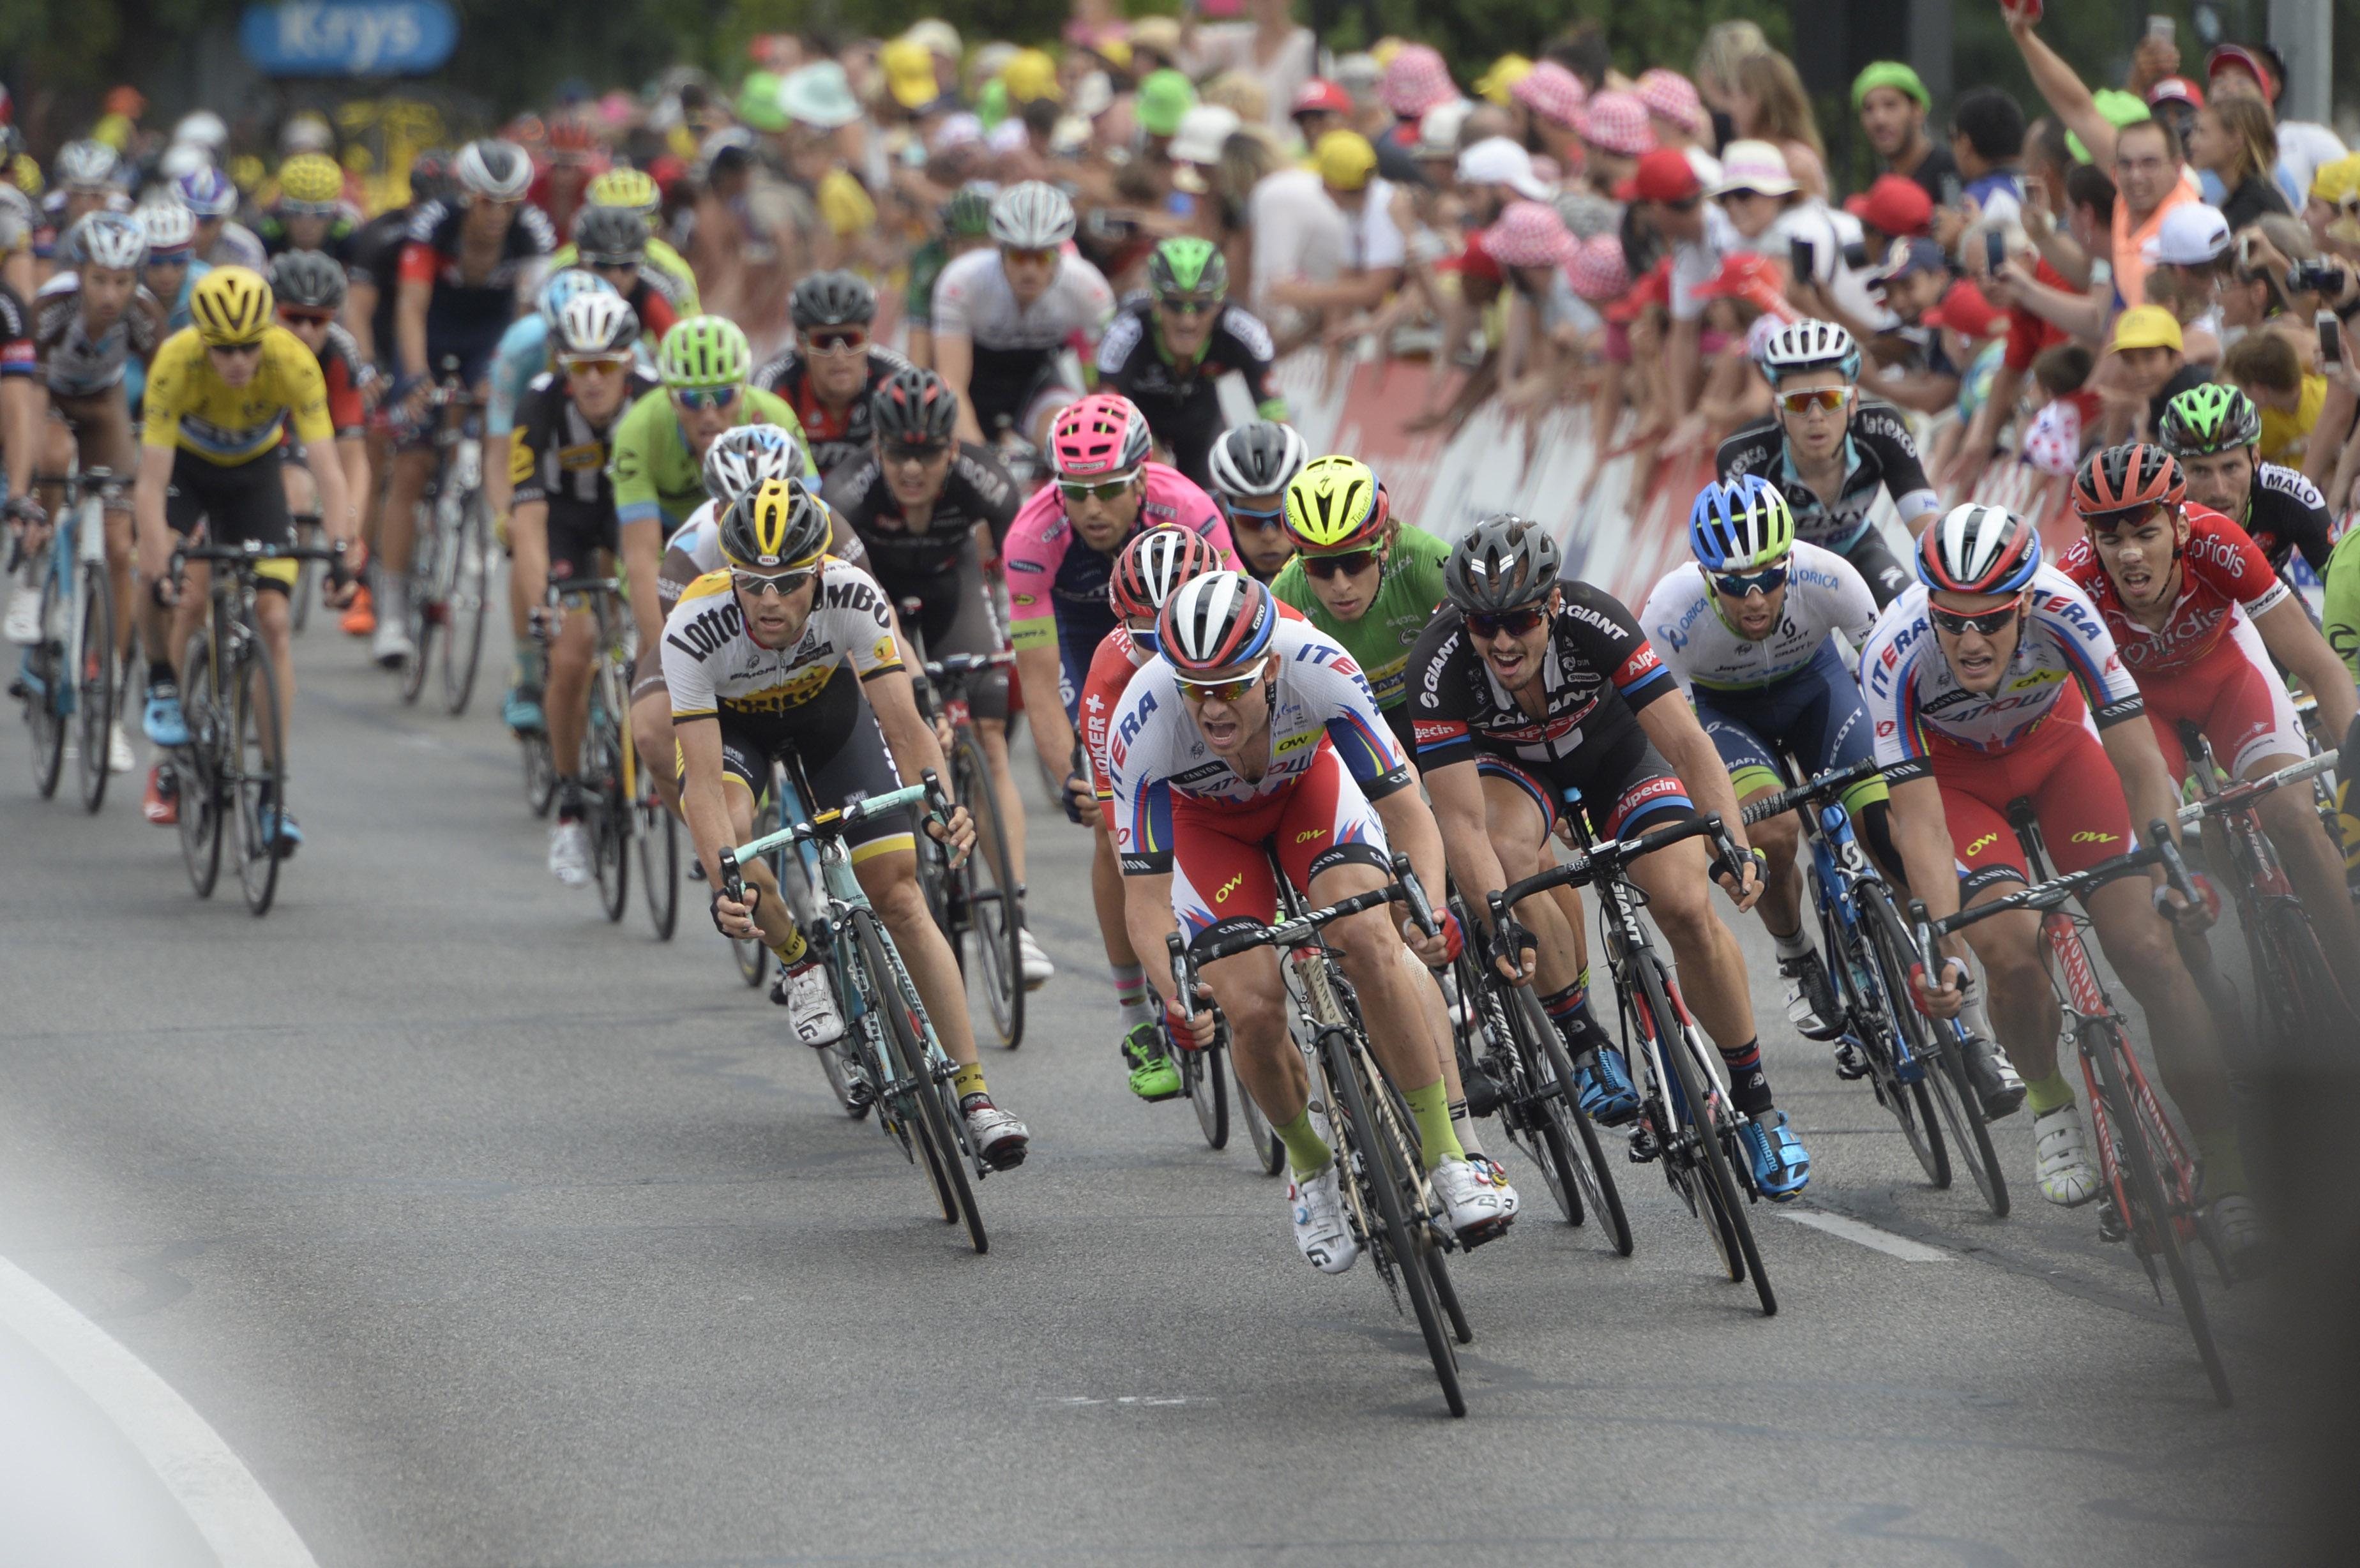 Andre Greipel gewinnt die 15. Etappe der Tour de France 2015. (pic: Sirotti)